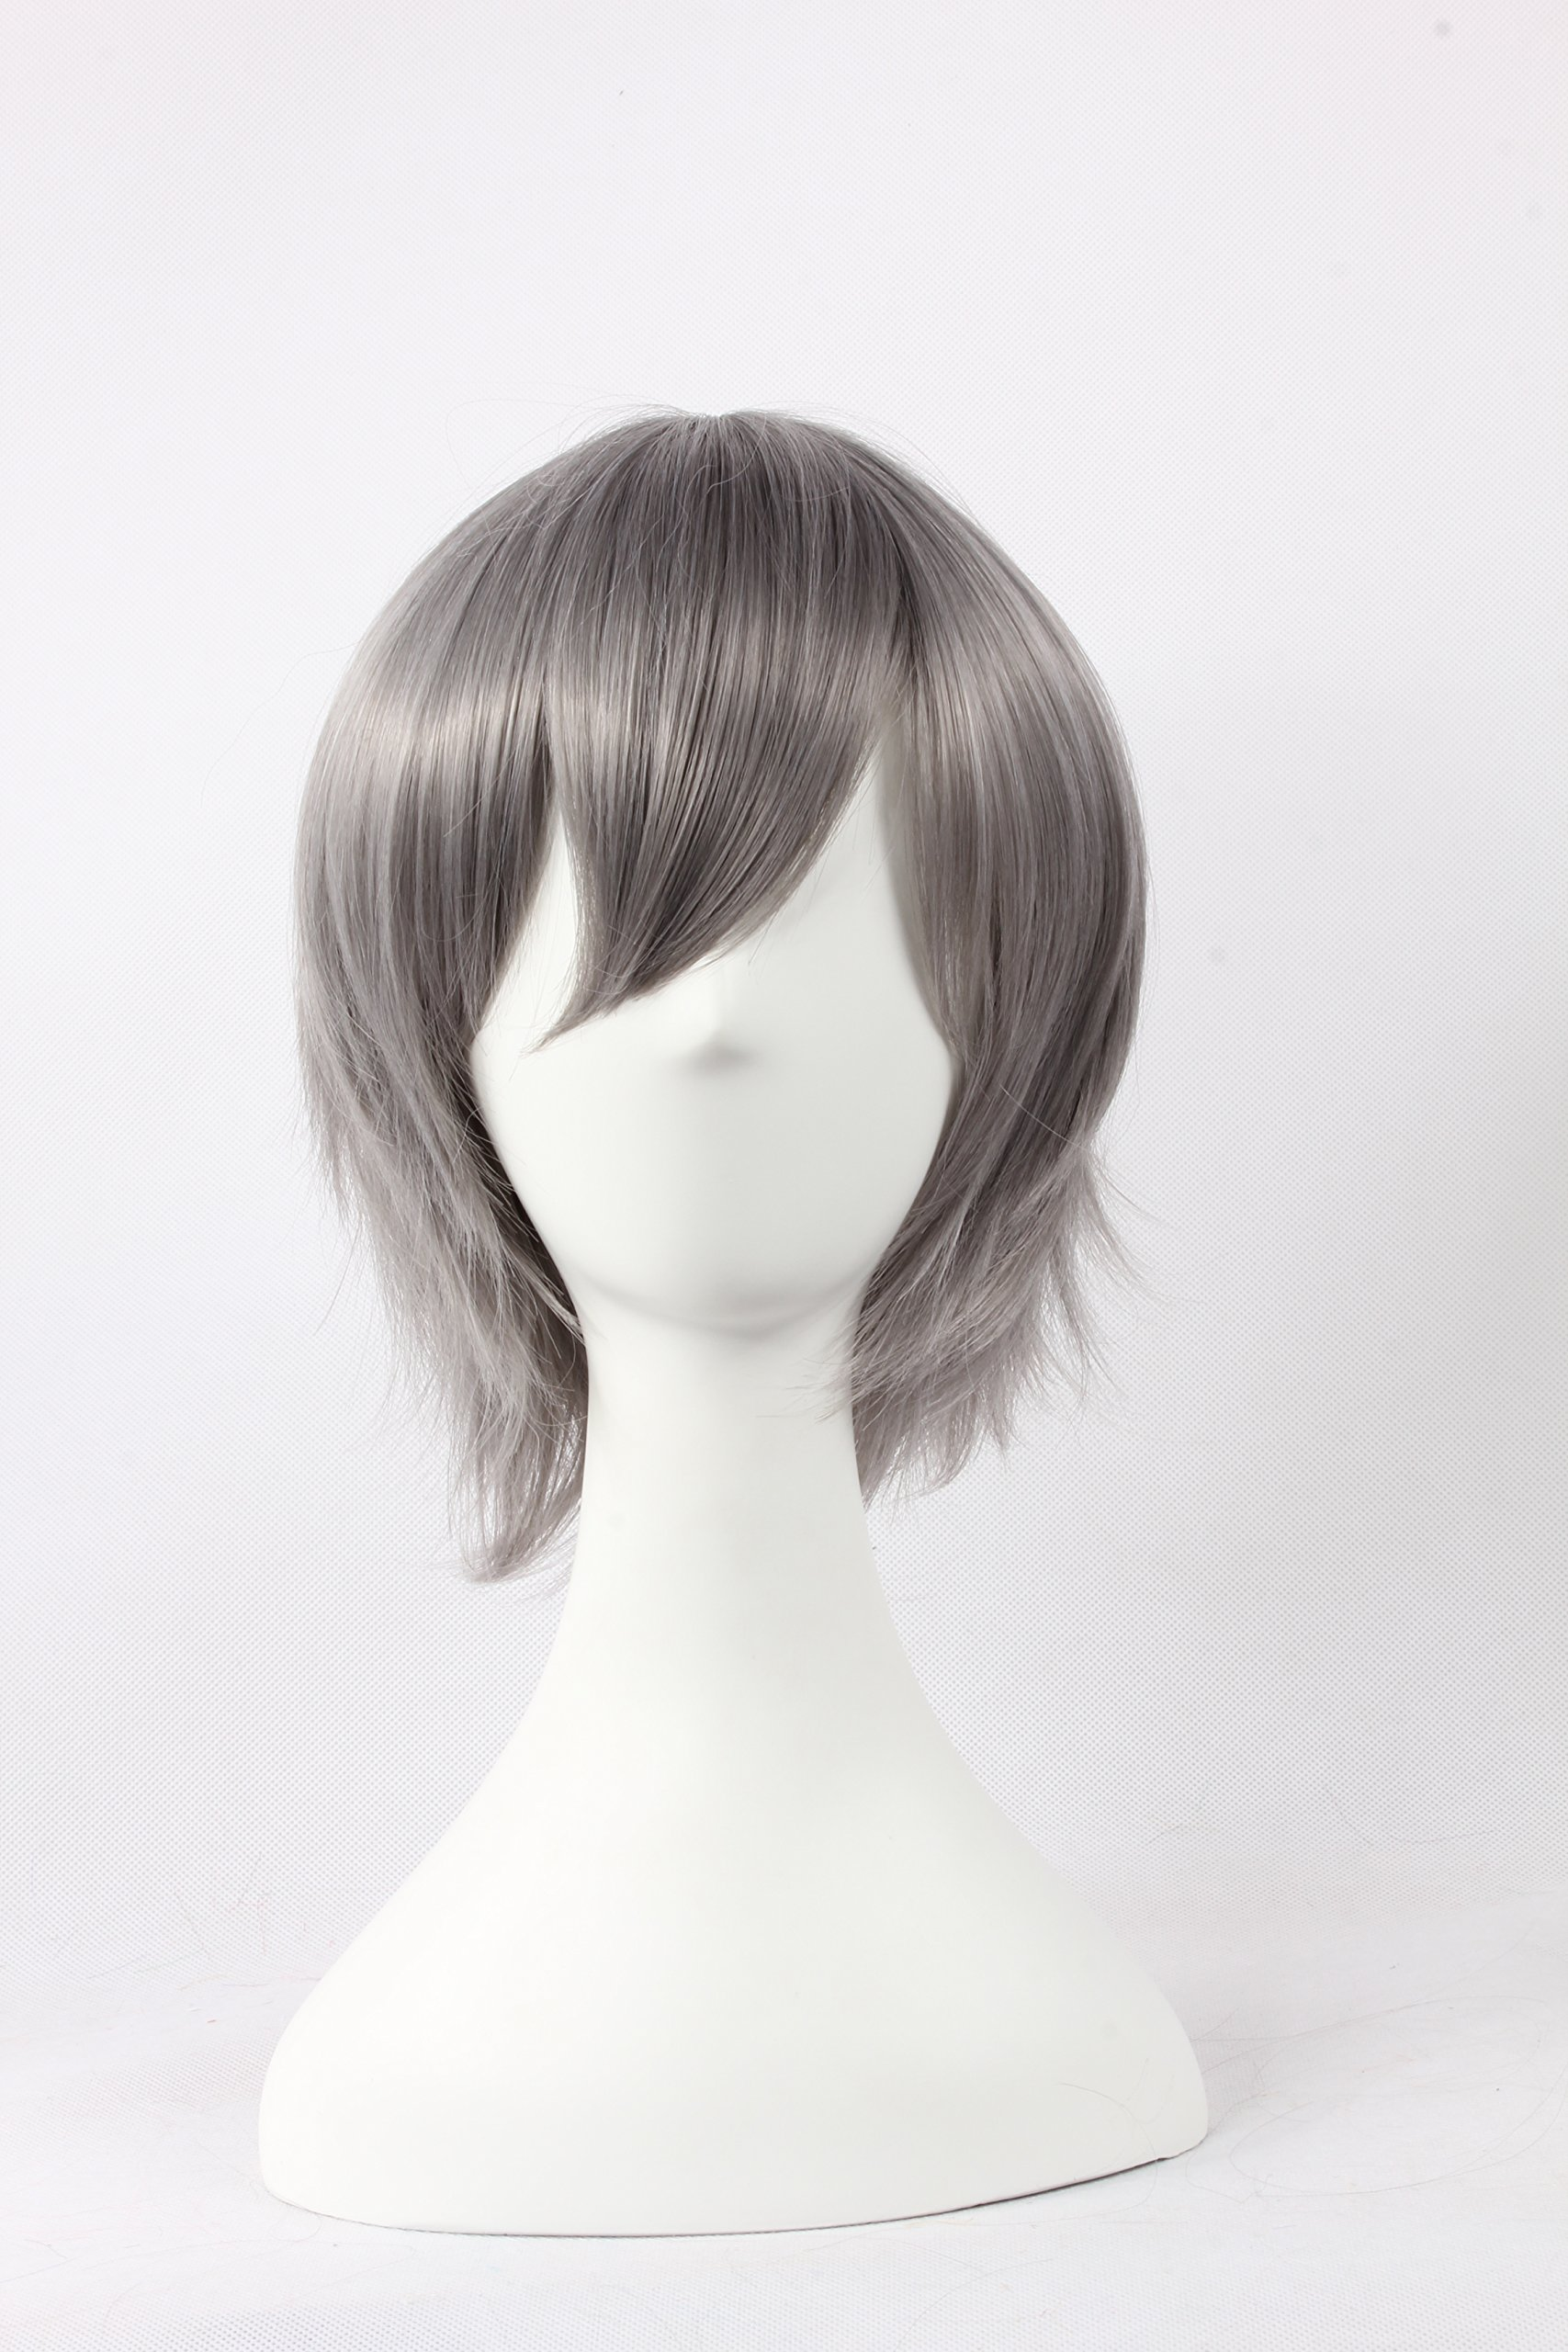 Coolsky Wigs Neon Genesis Evangelion,Light Katekyo Hitman Reborn,Jigoku Shoujo Mix Gray Hair Cosplay